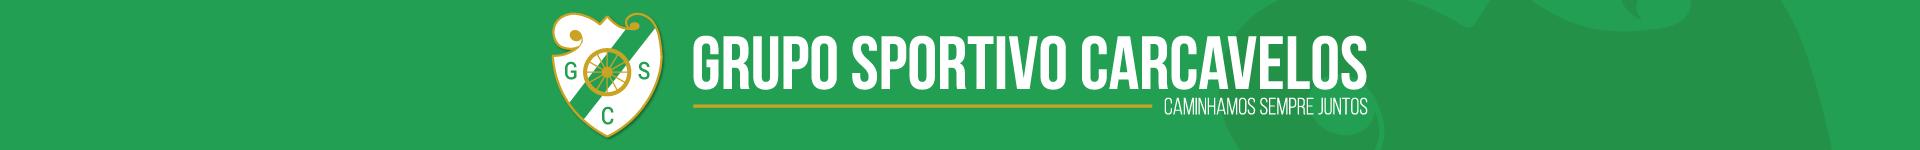 Grupo Sportivo de Carcavelos